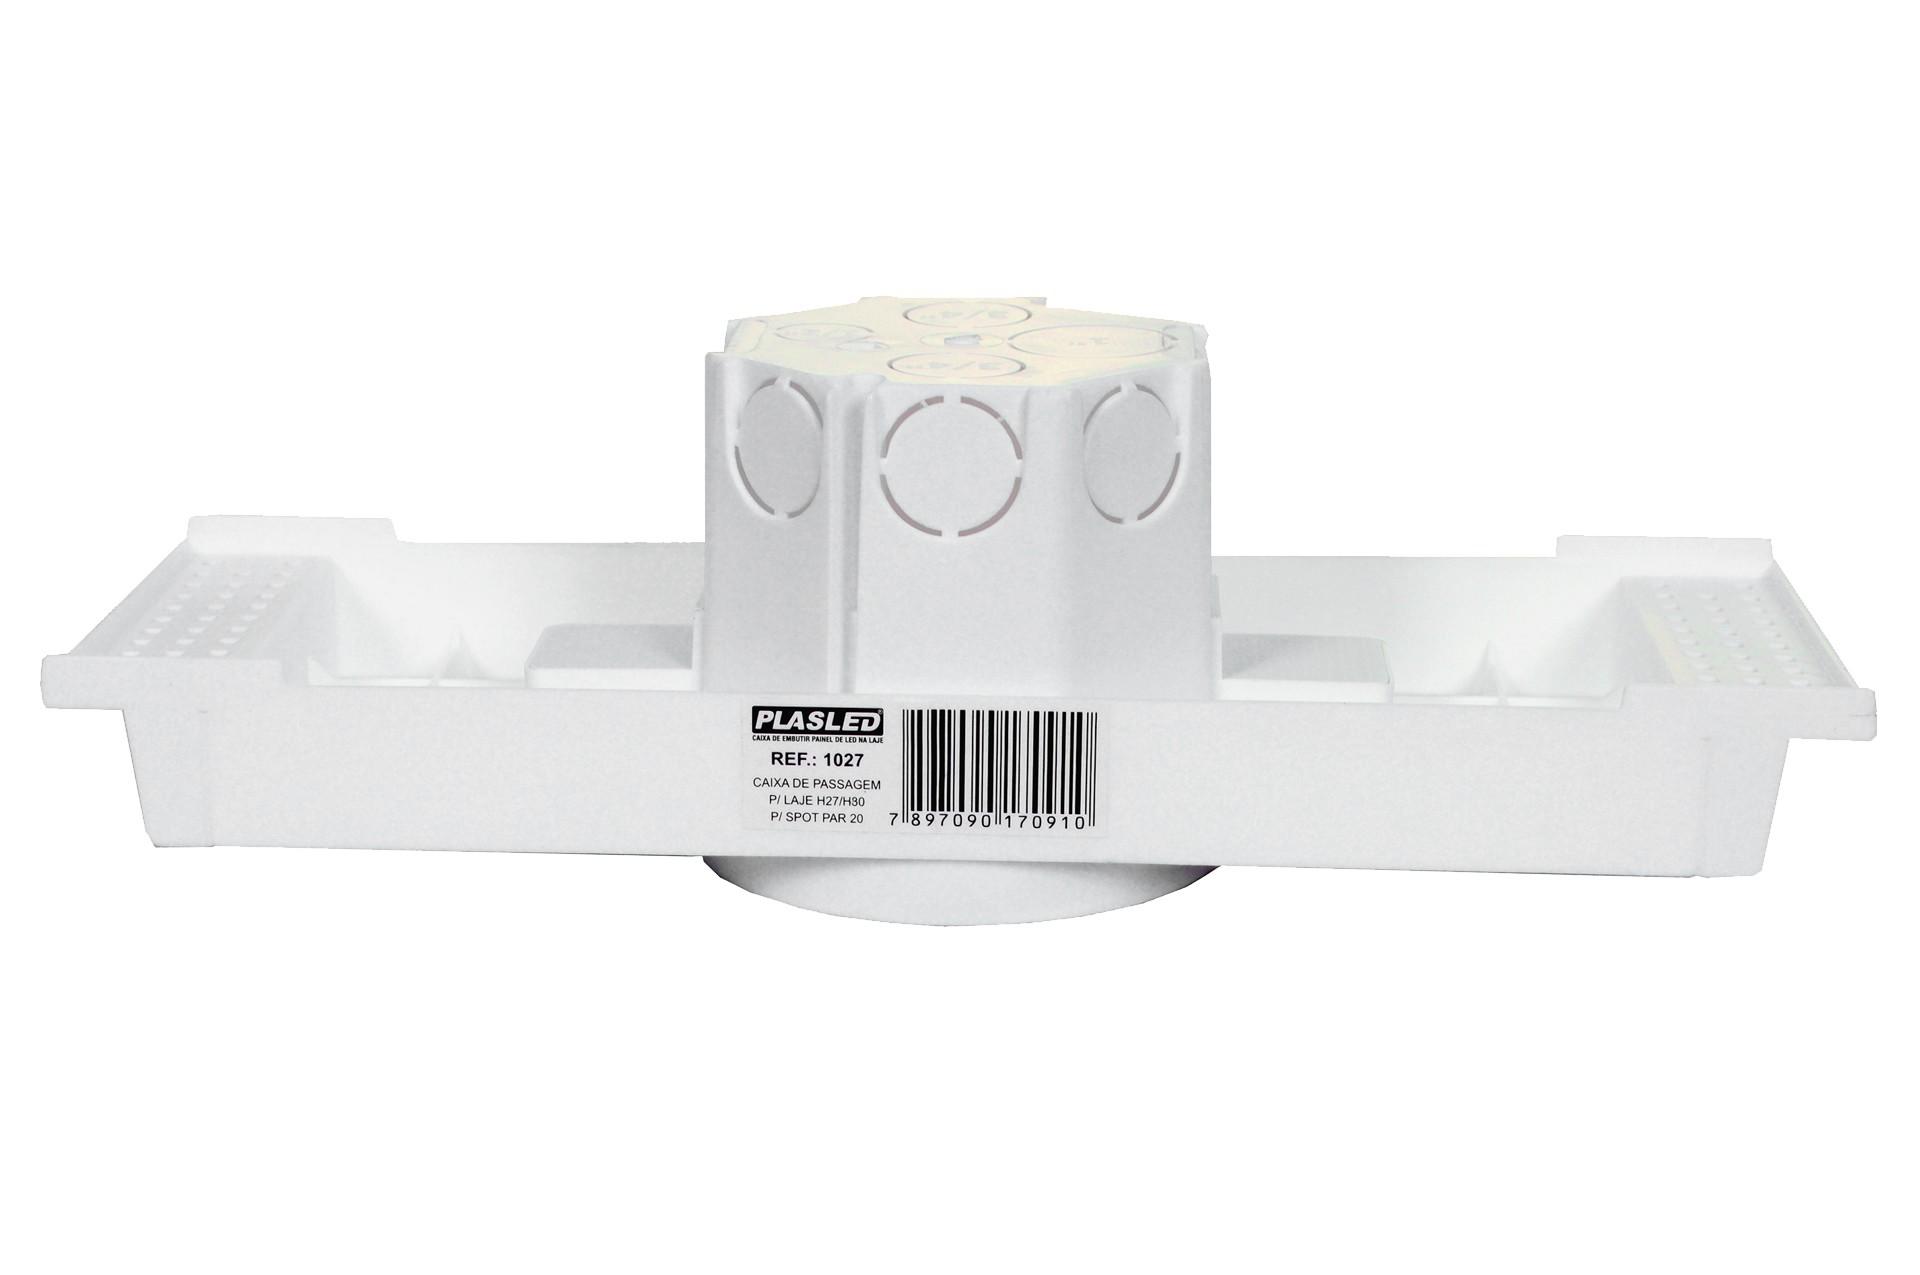 Kit Spot 7w + Caixa Passagem Embutir Na Laje Plasled  - EMPORIO K